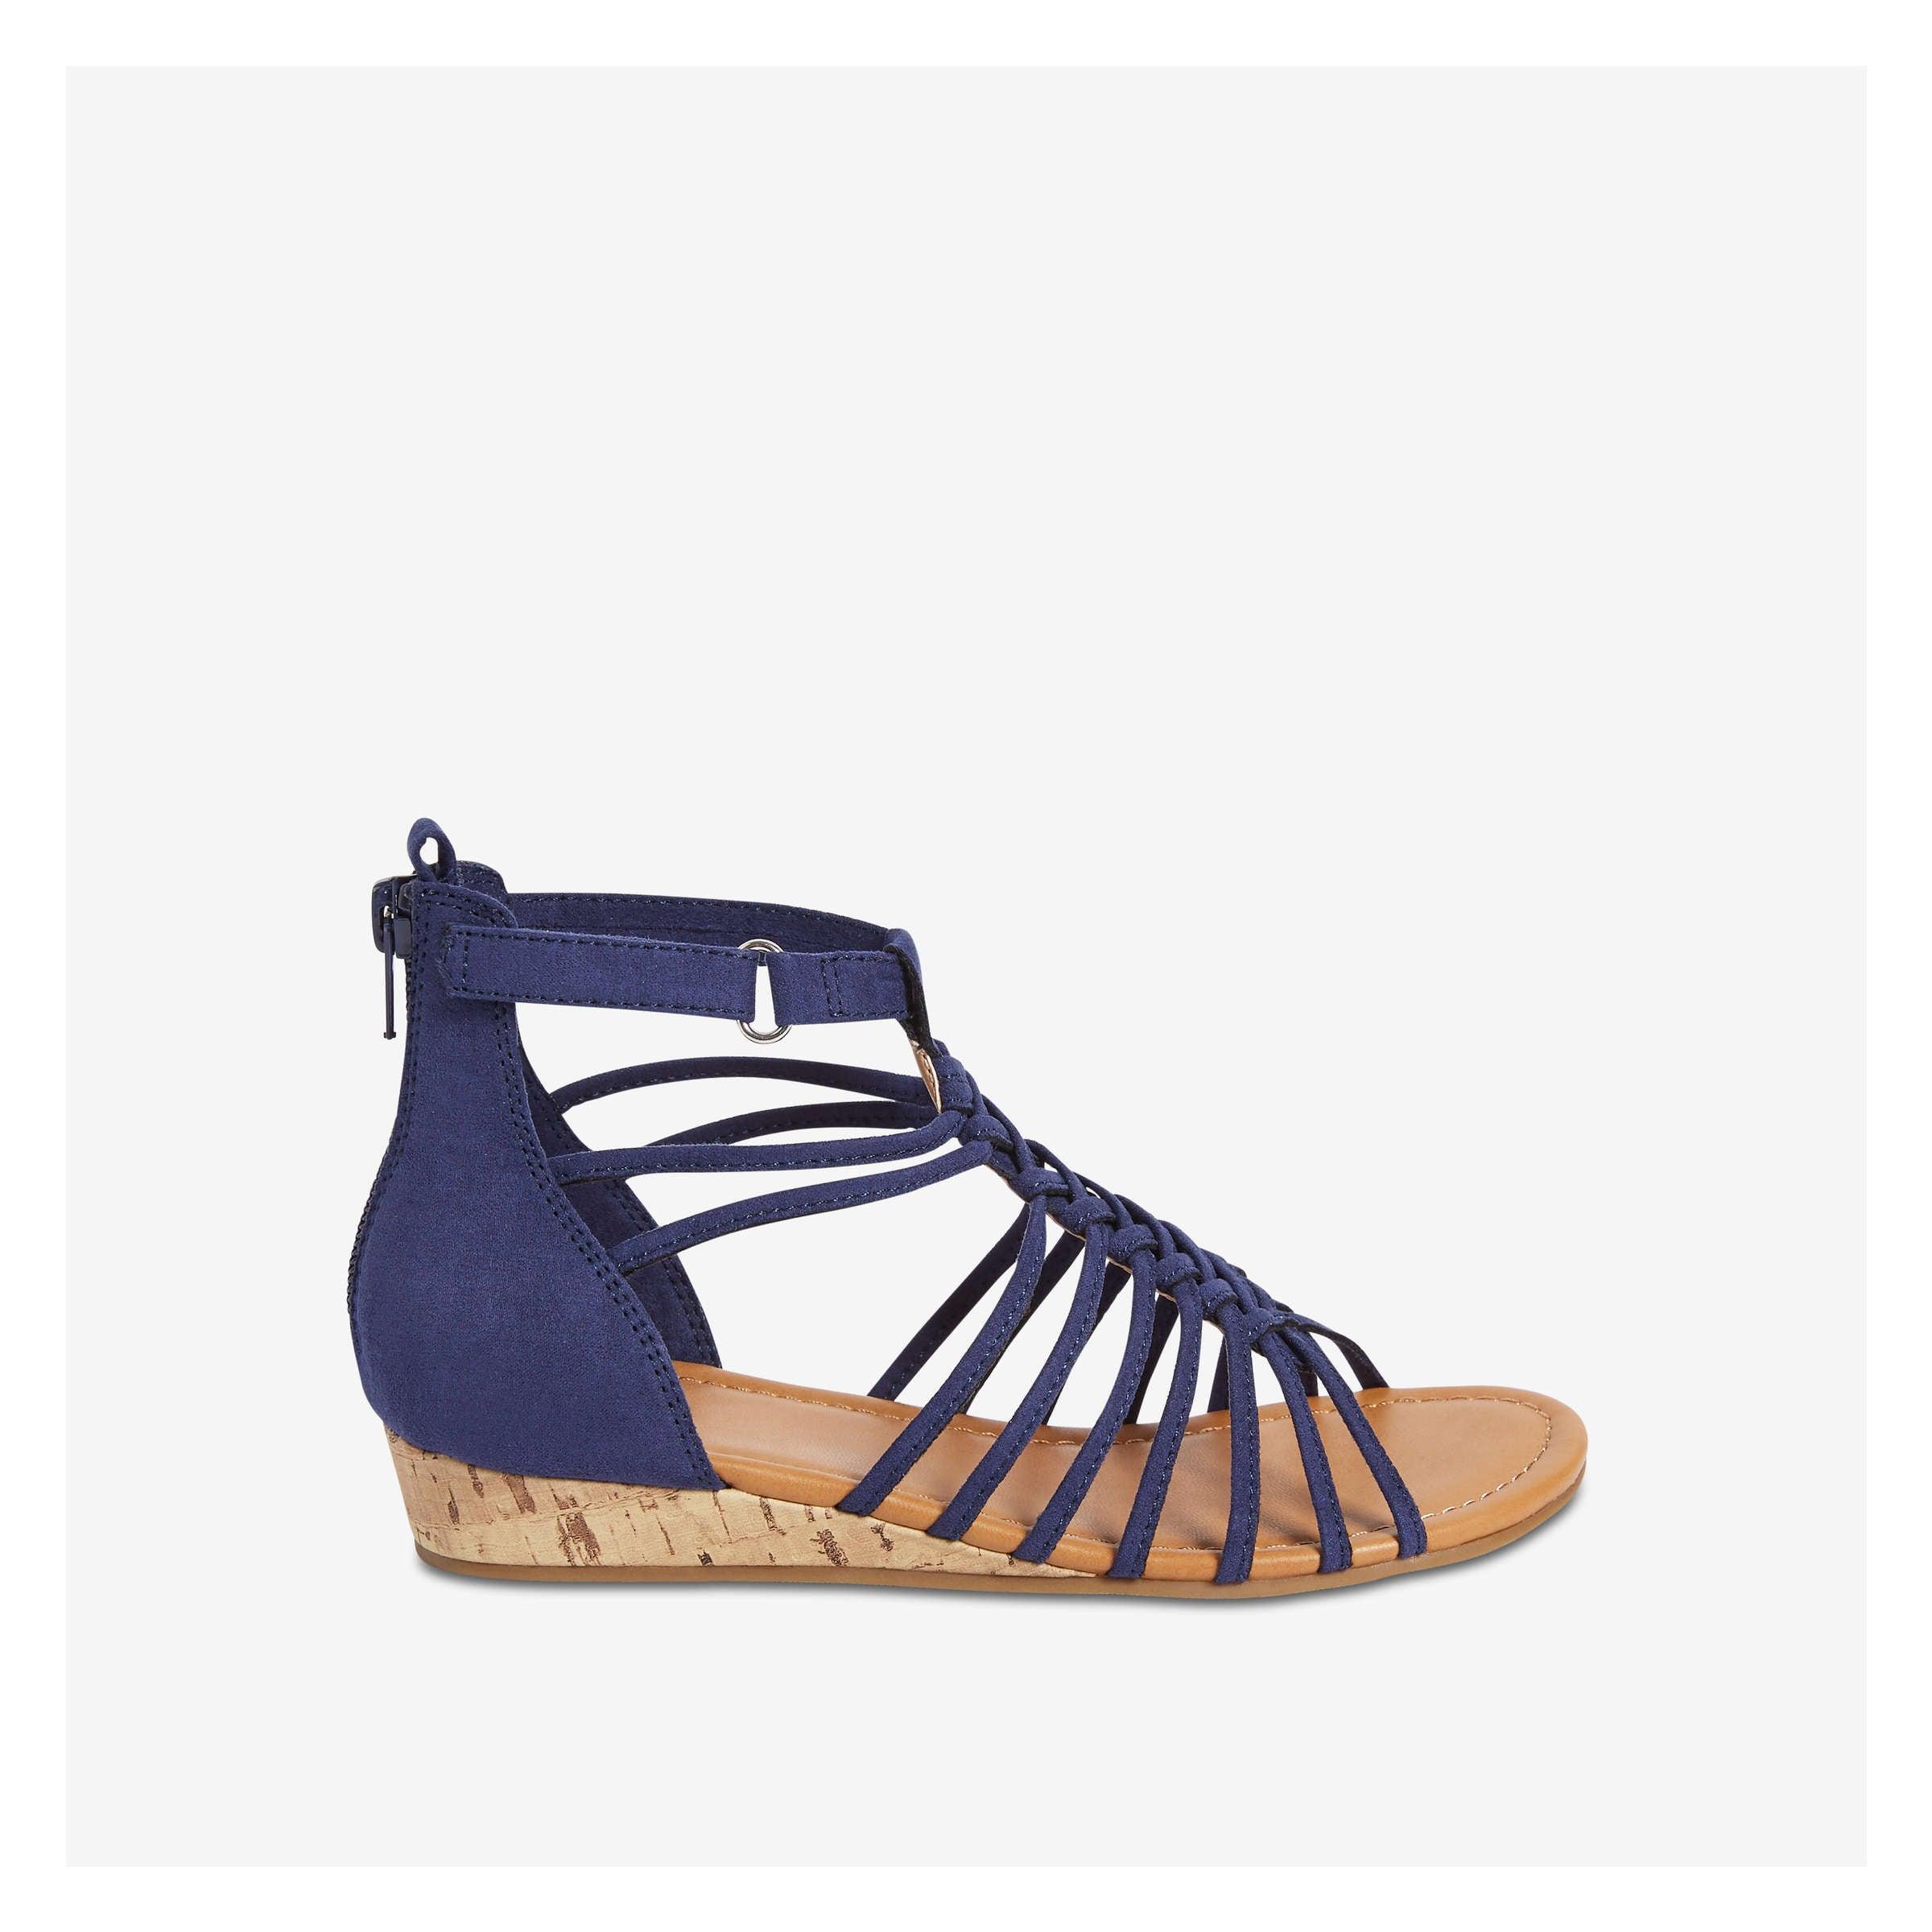 736f82839c1 Joe Fresh Kid Girls' Gladiator Sandal